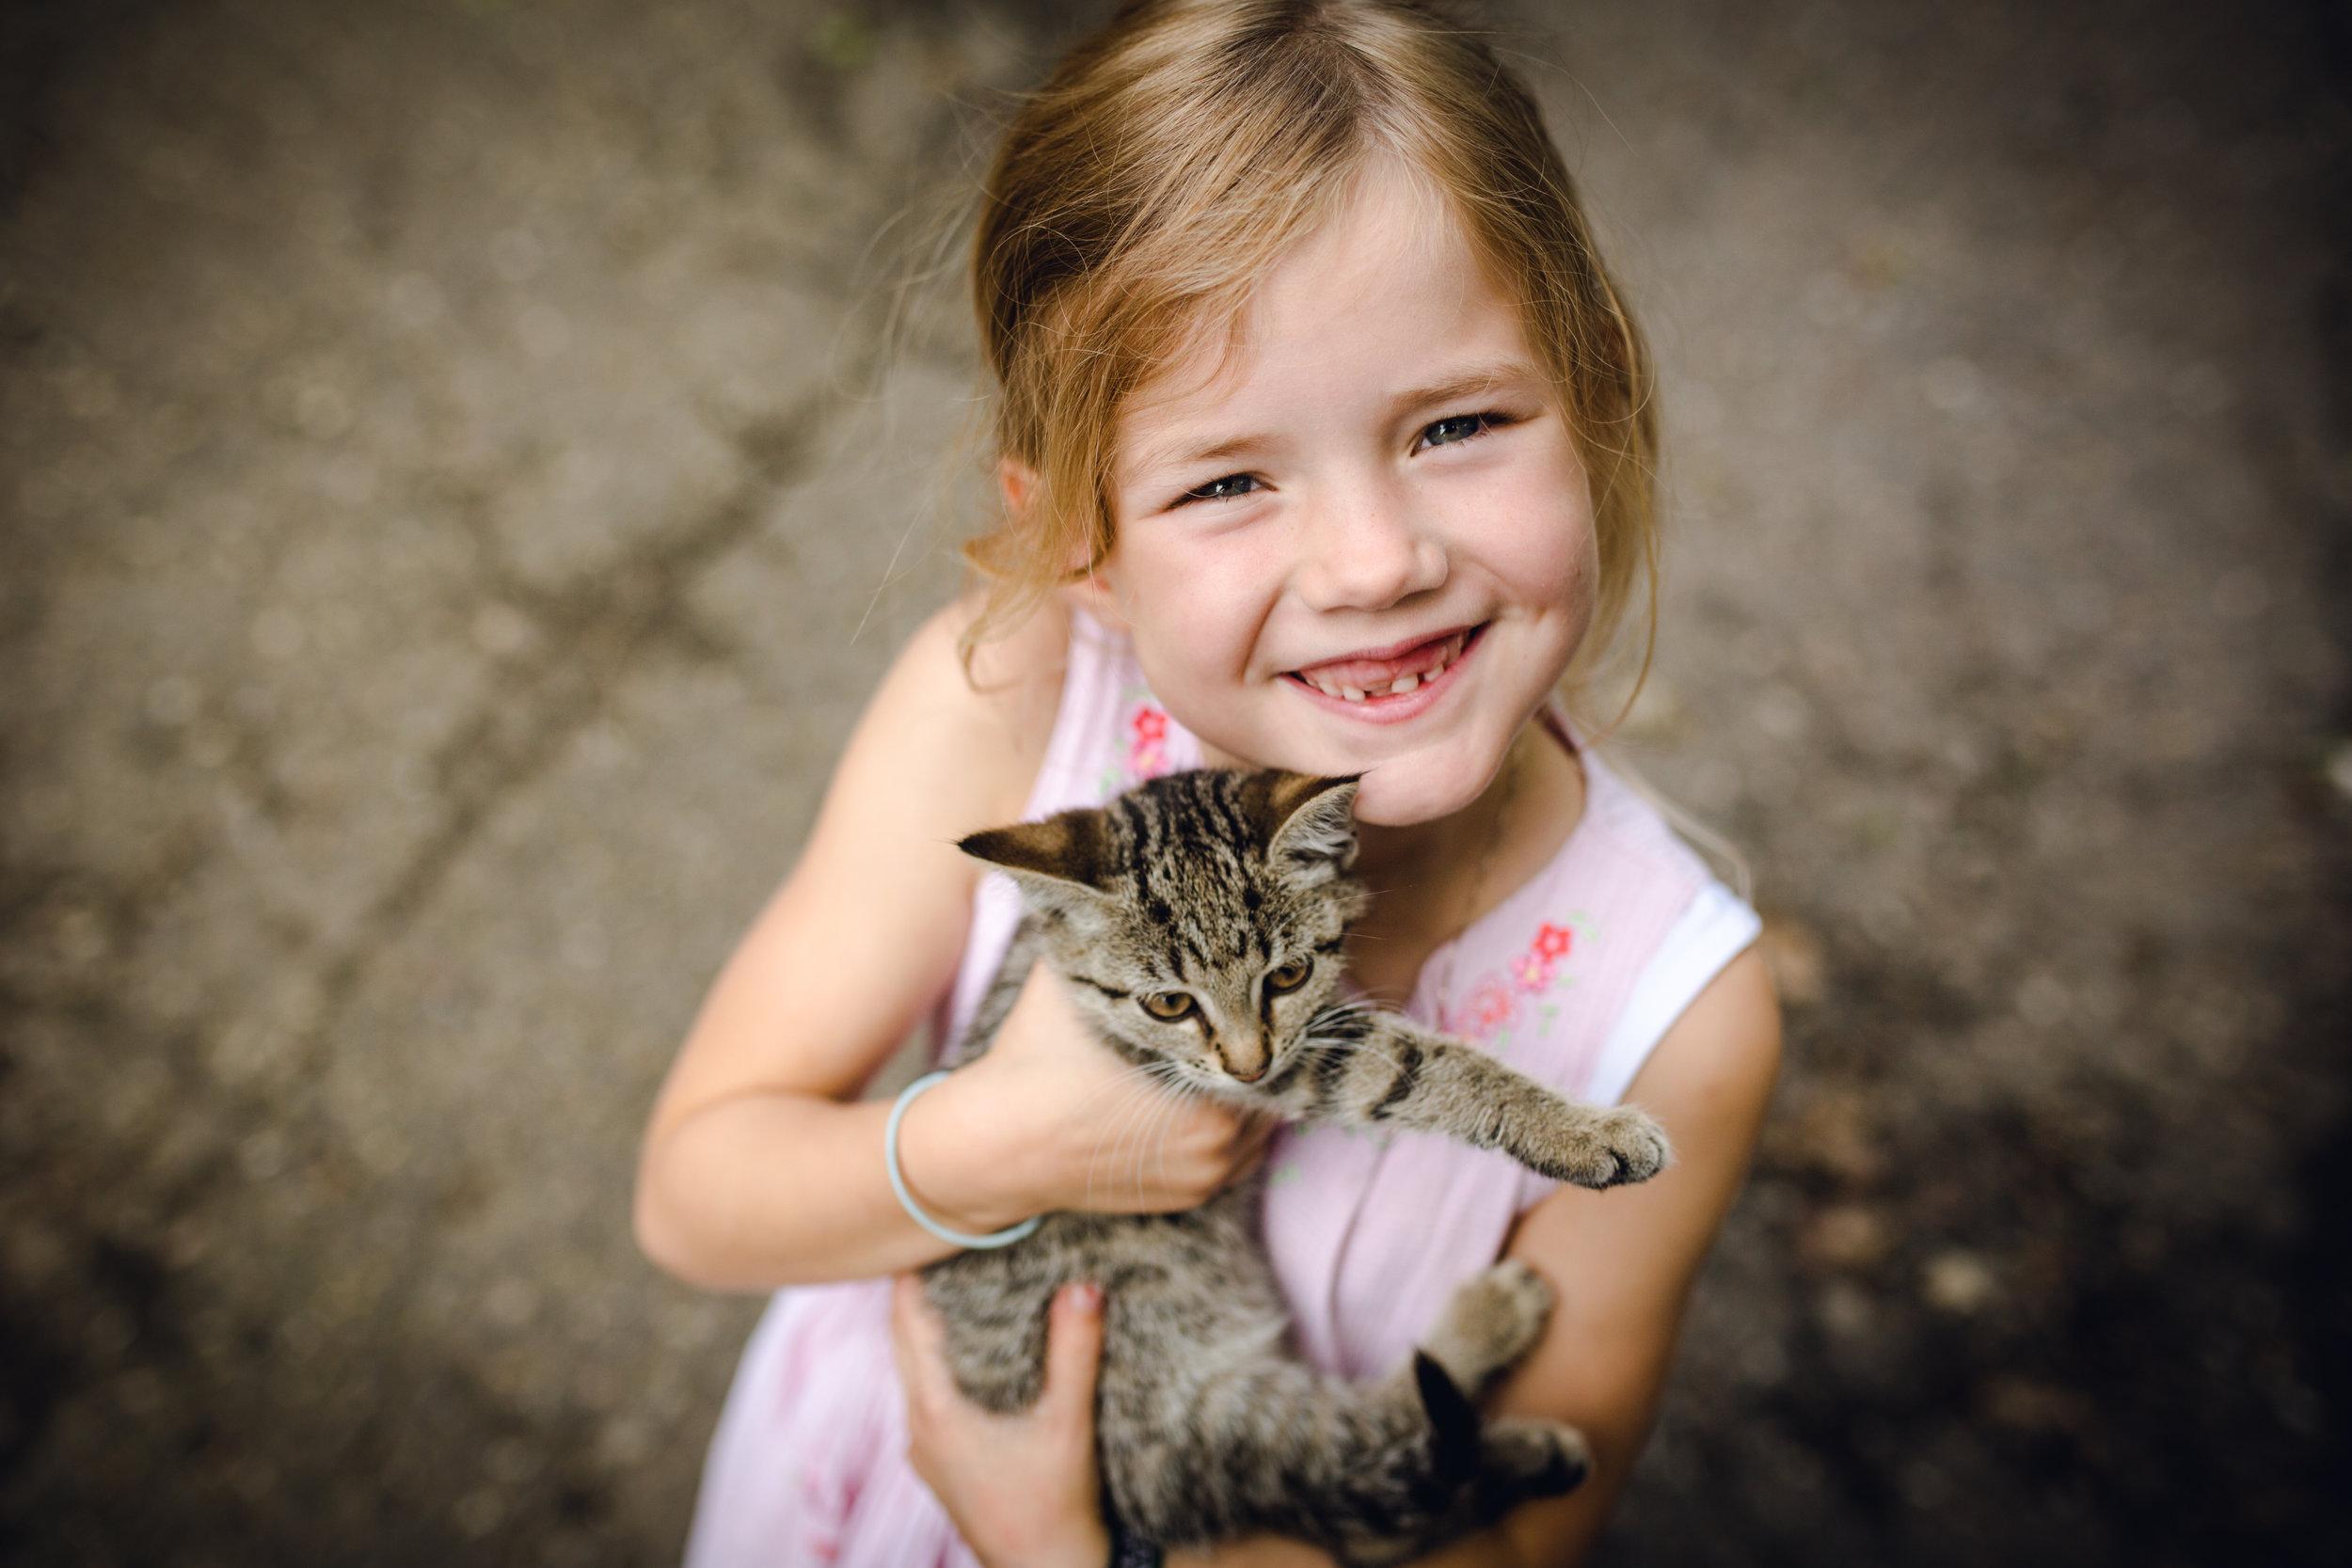 kinderfotografie.jpg